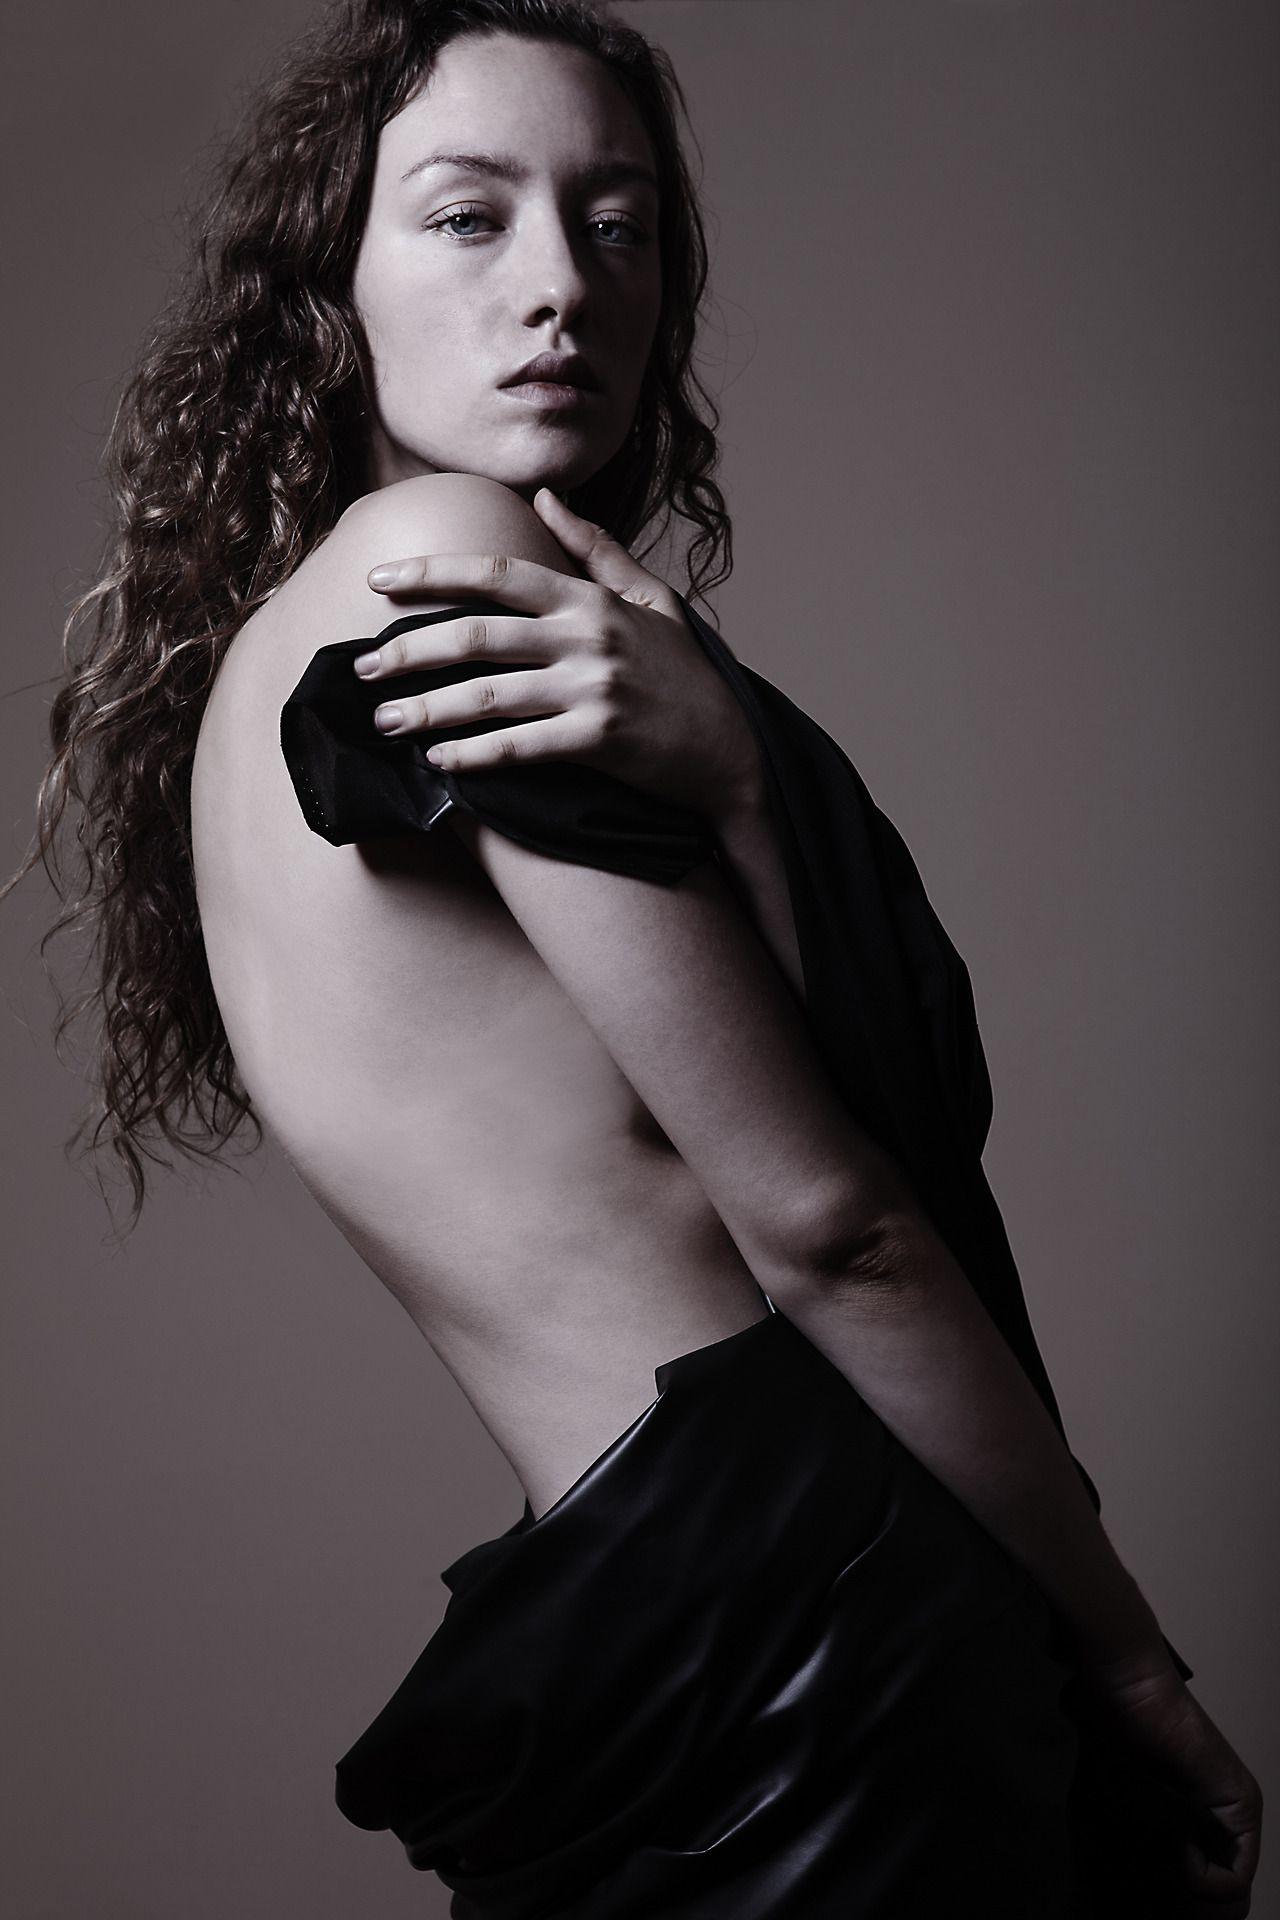 Johanna Stickland nude (41 fotos), foto Erotica, Instagram, cleavage 2017